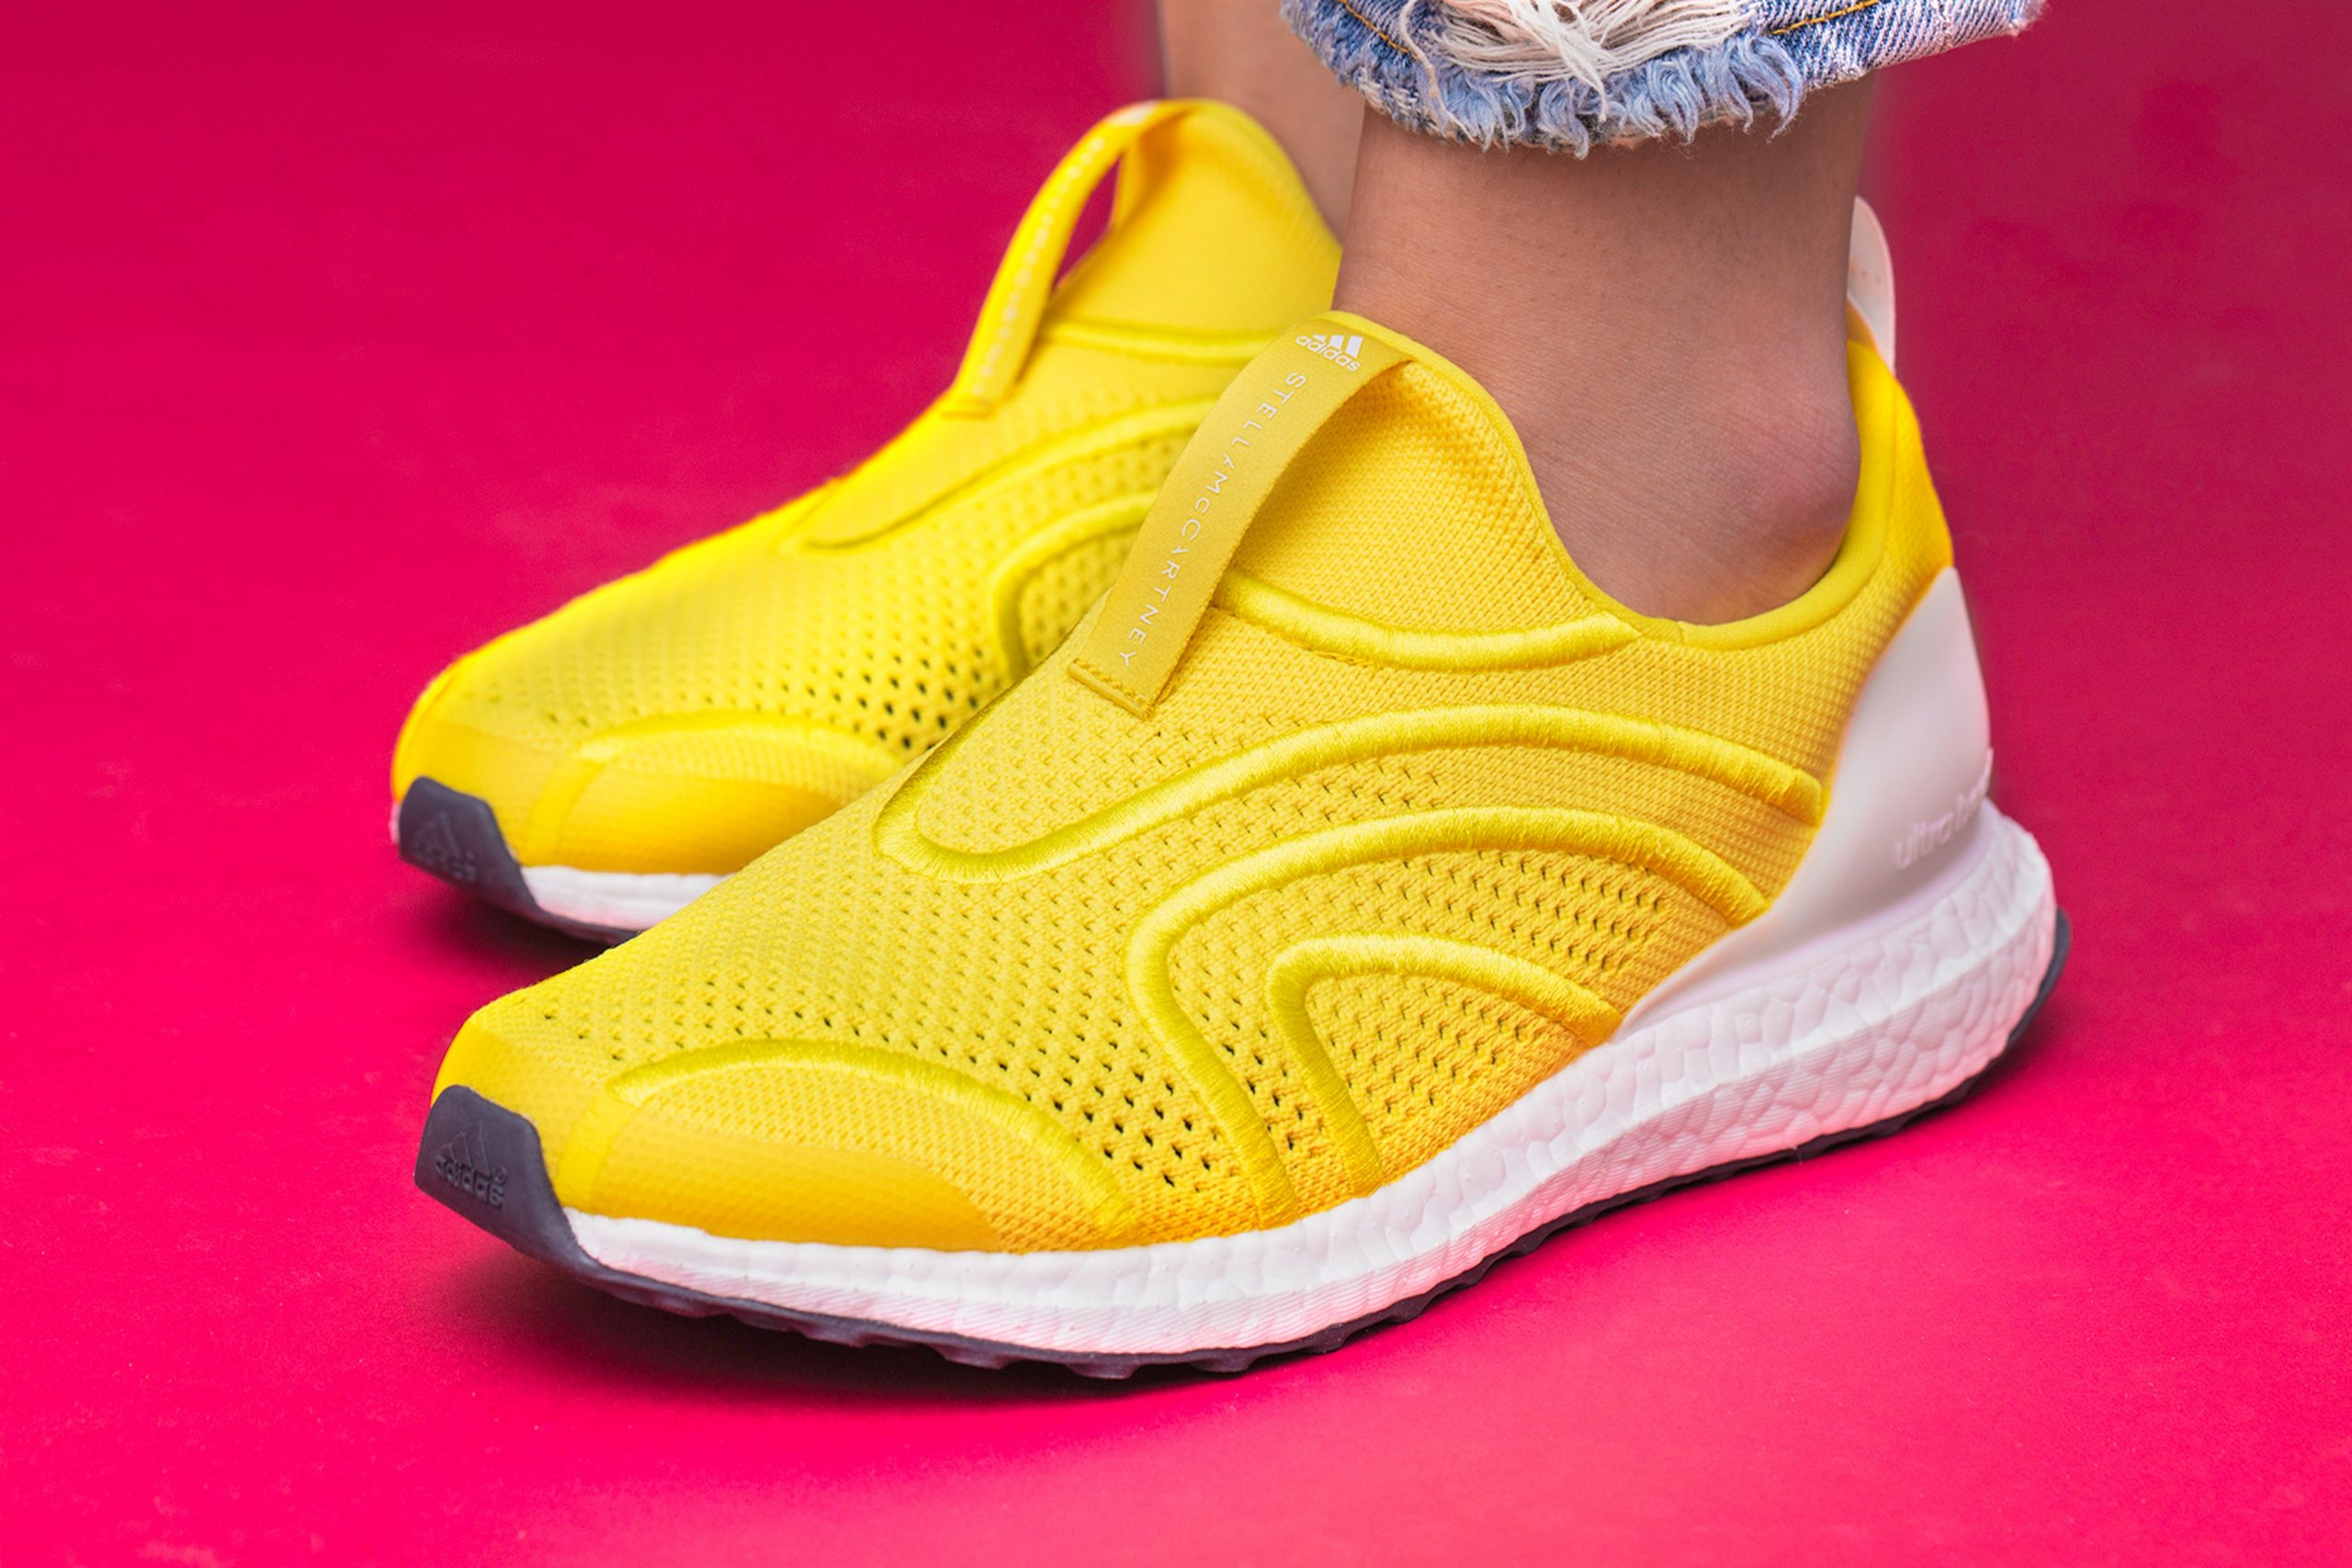 Adidas by Stella McCartney UltraBOOST Uncaged version revealed